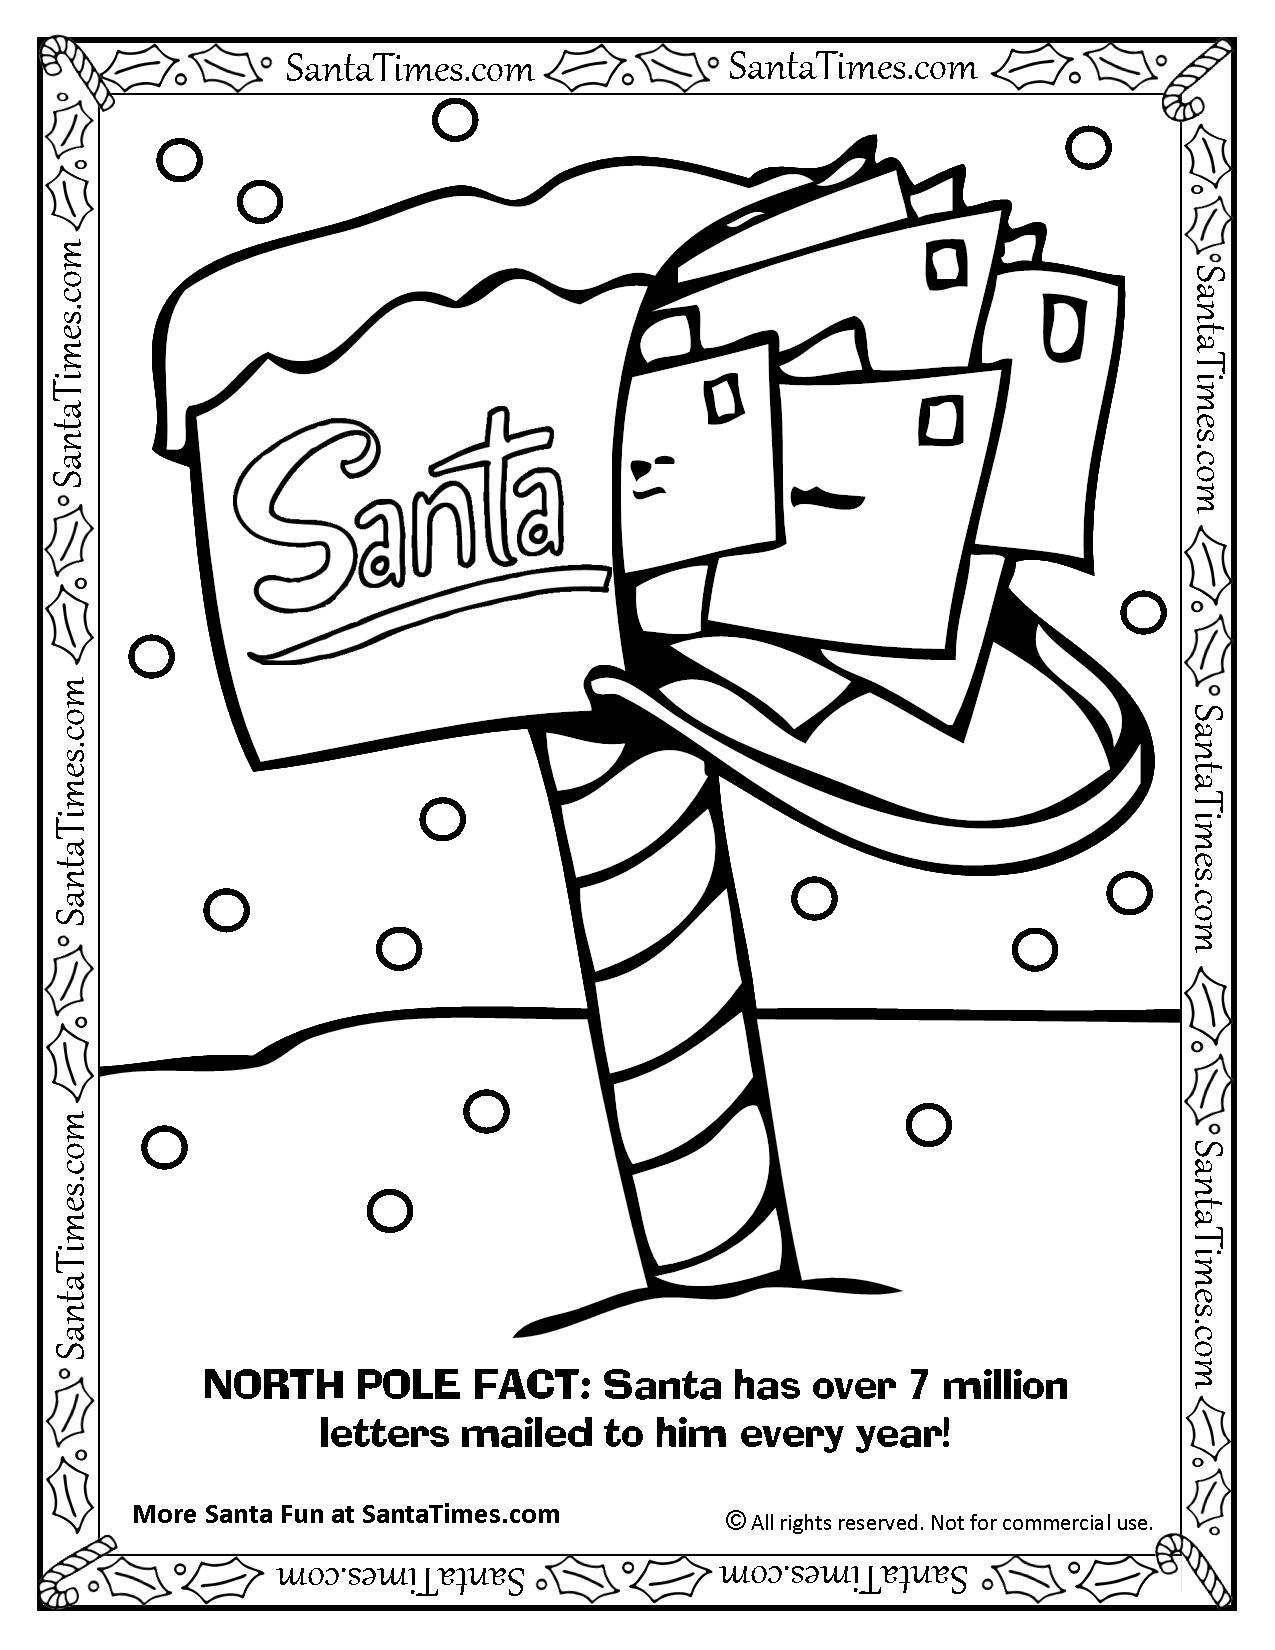 Santa S North Pole Mailbox Coloring Page Printout More